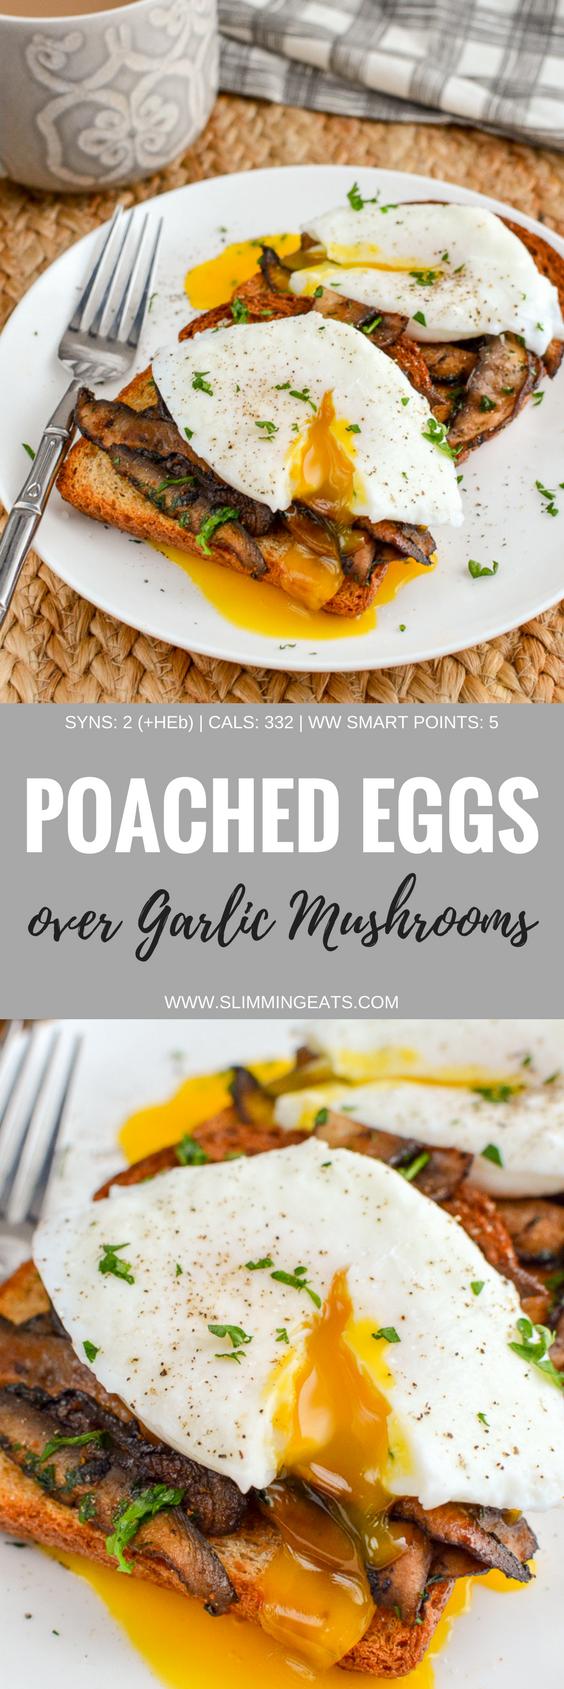 pinterest pin - poached eggs over garlic mushrooms